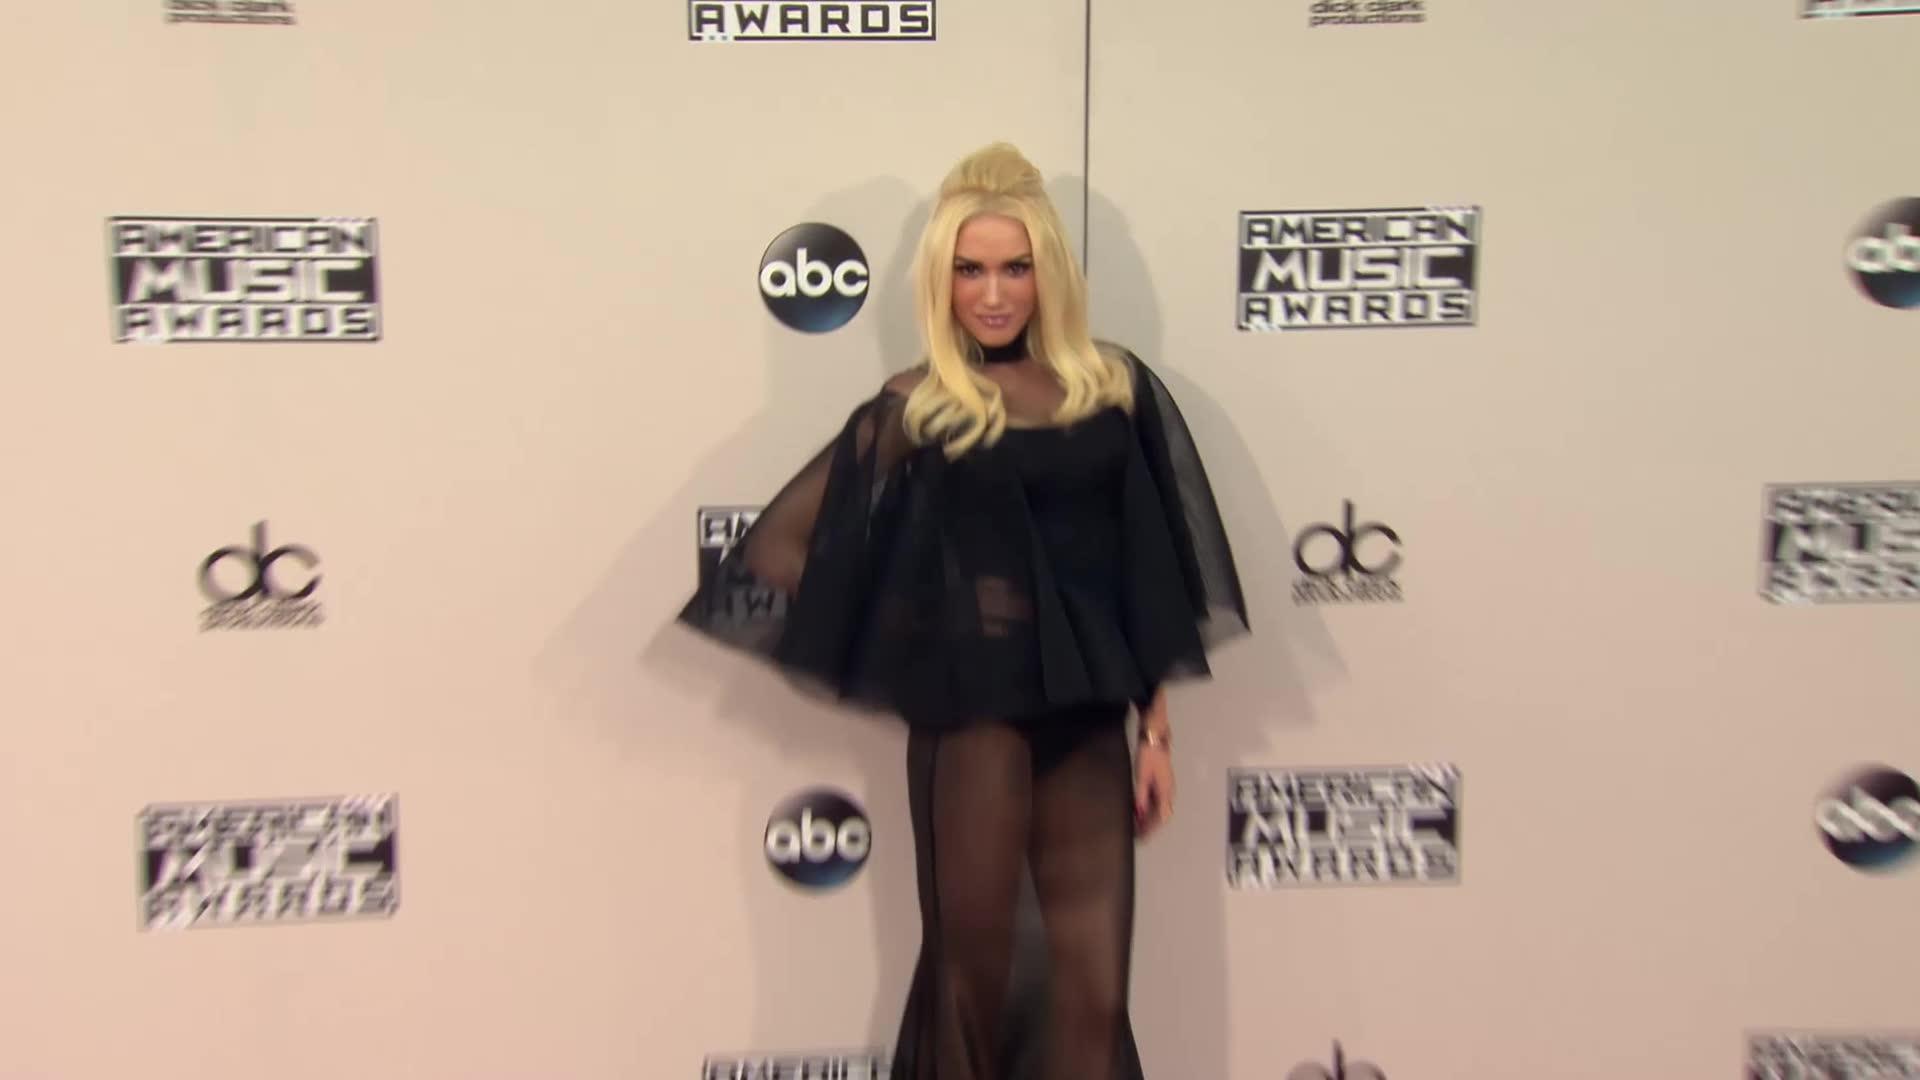 Gwen Stefani's New Single Reflects on New Relationship With Blake Shelton